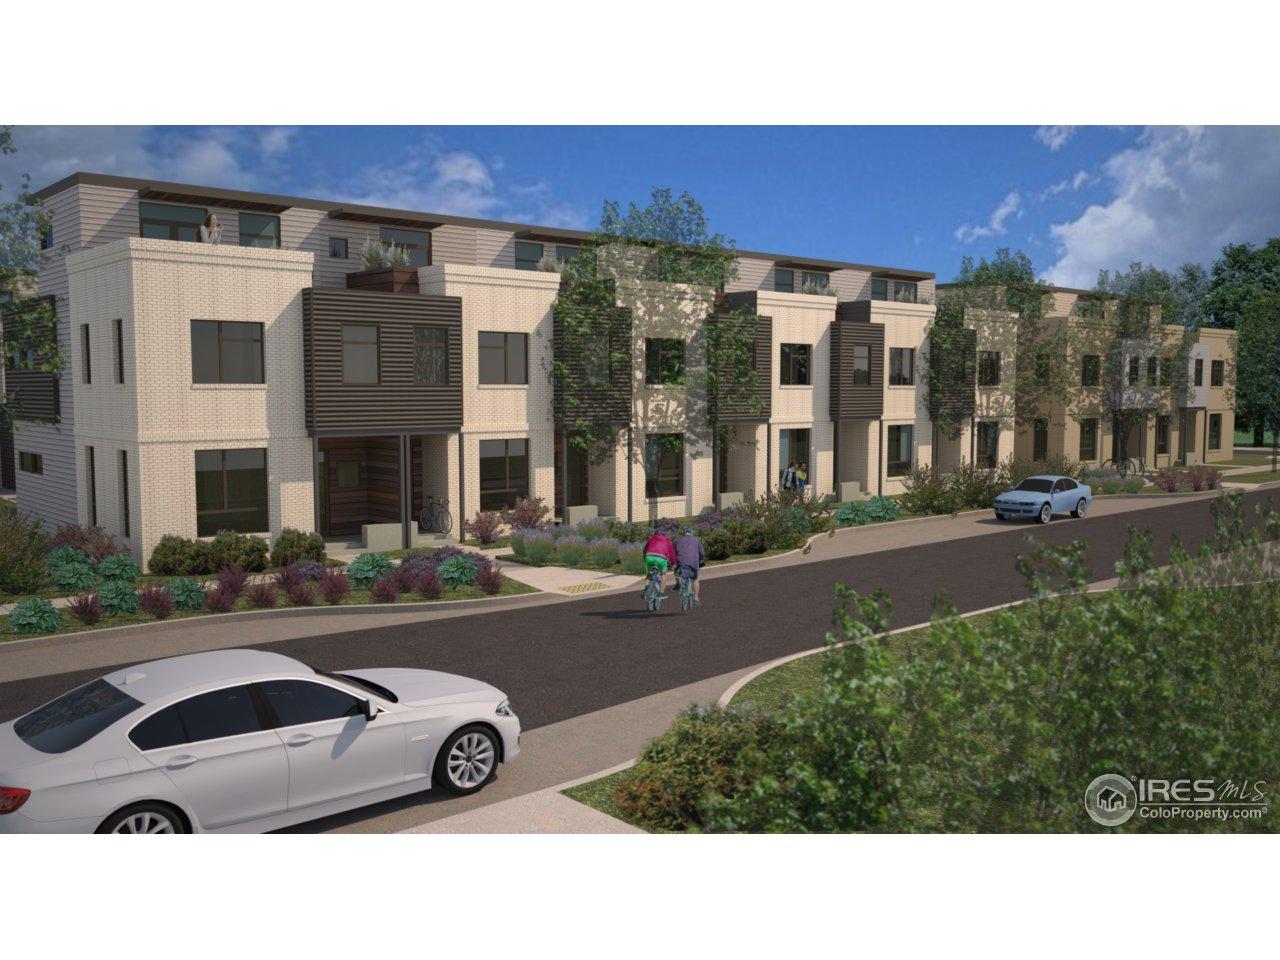 3129 Bluff St, Boulder CO 80301